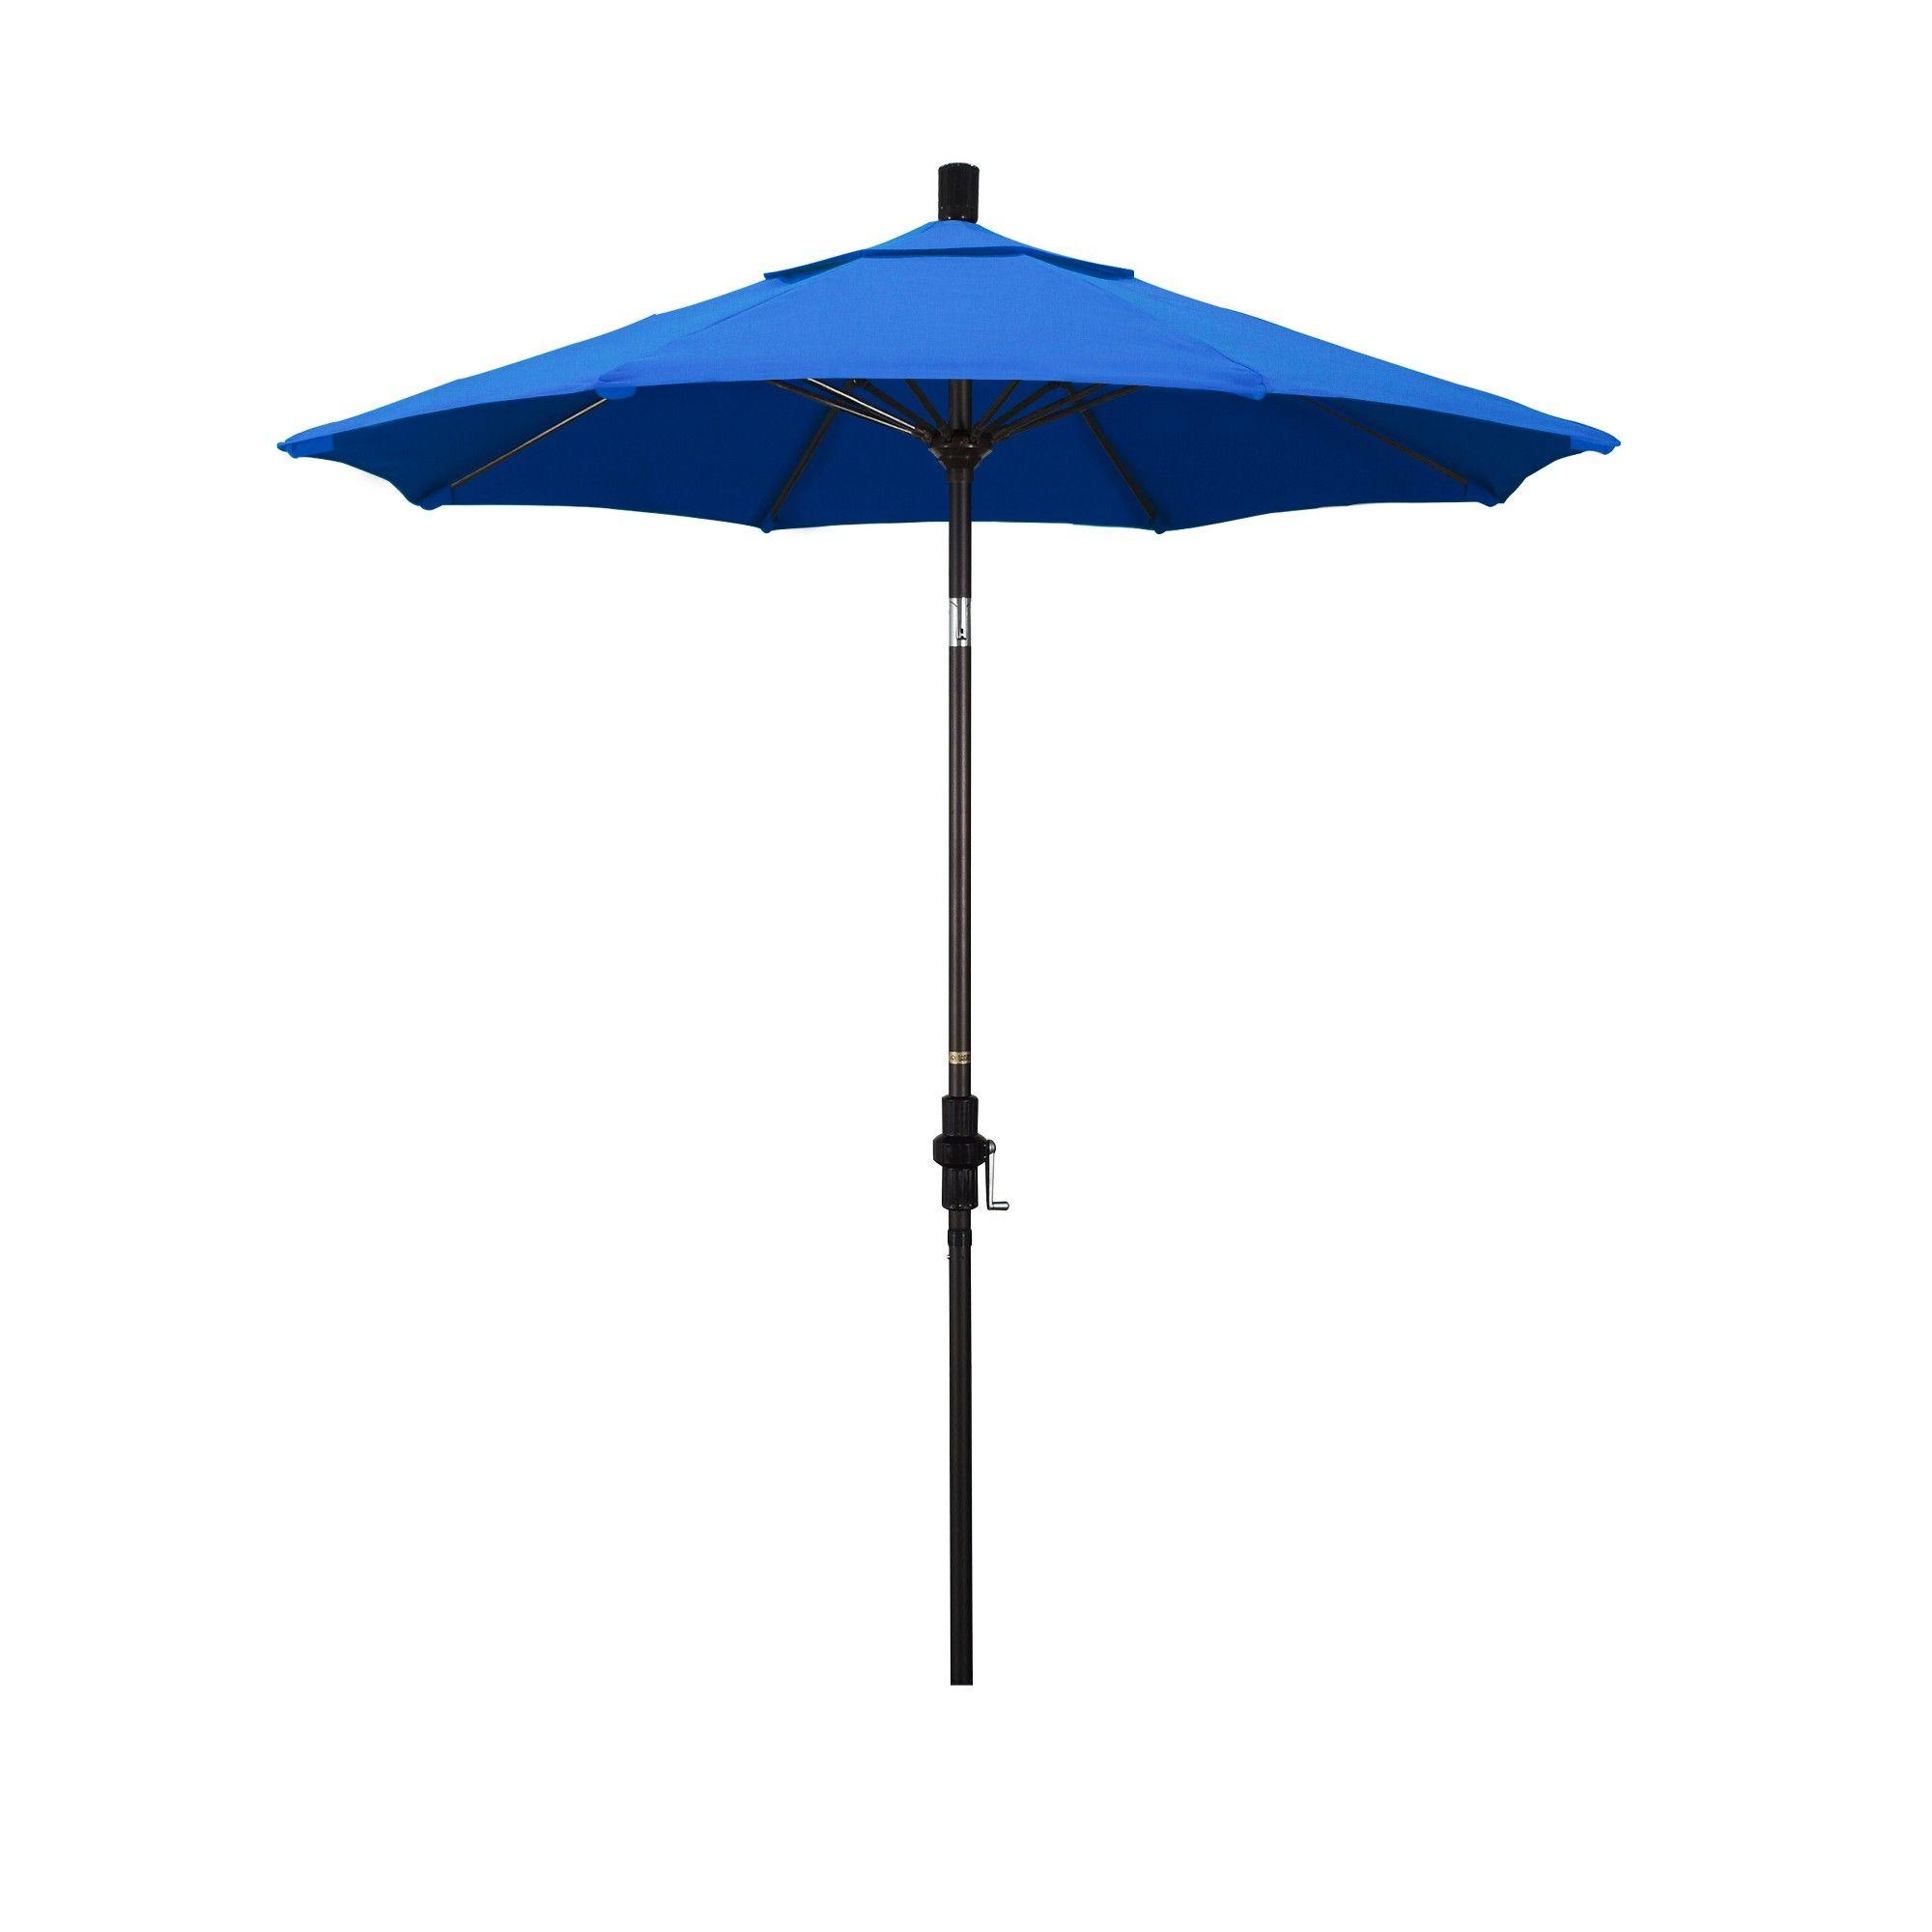 7 5 Aluminum Collar Tilt Crank Patio Umbrella Blue Olefin